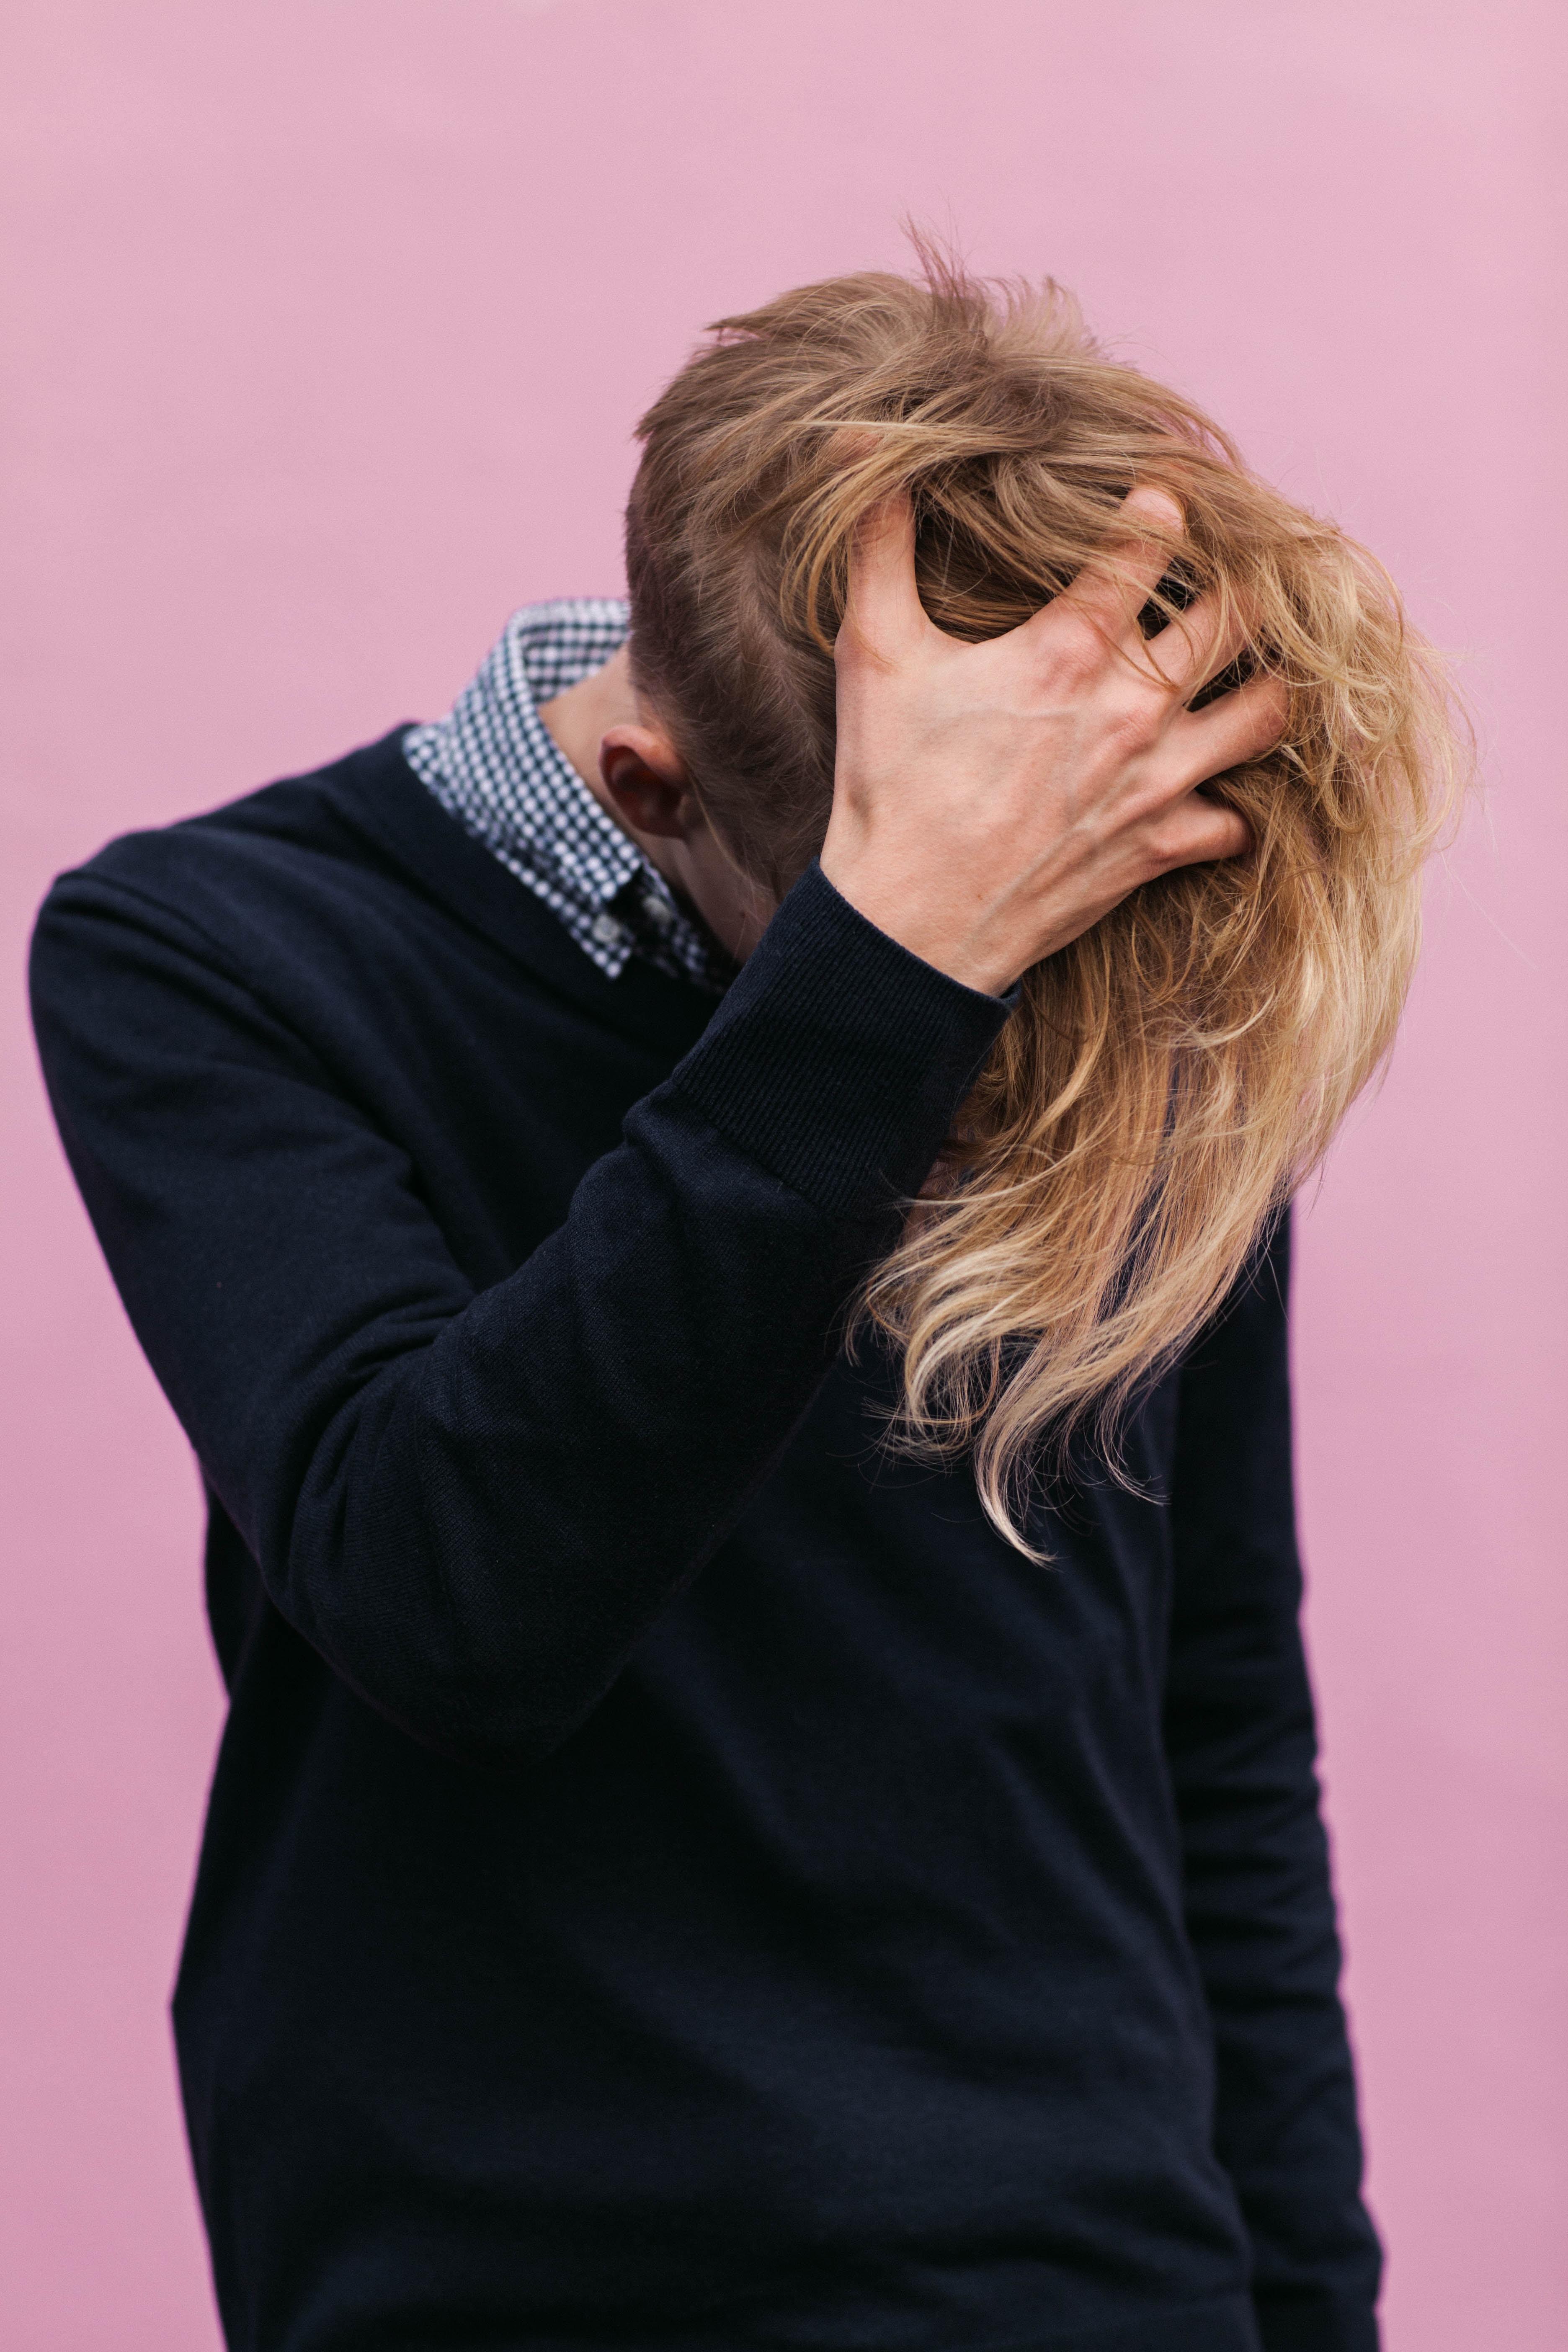 man wearing black crew-neck sweatshirt with hand running through hair